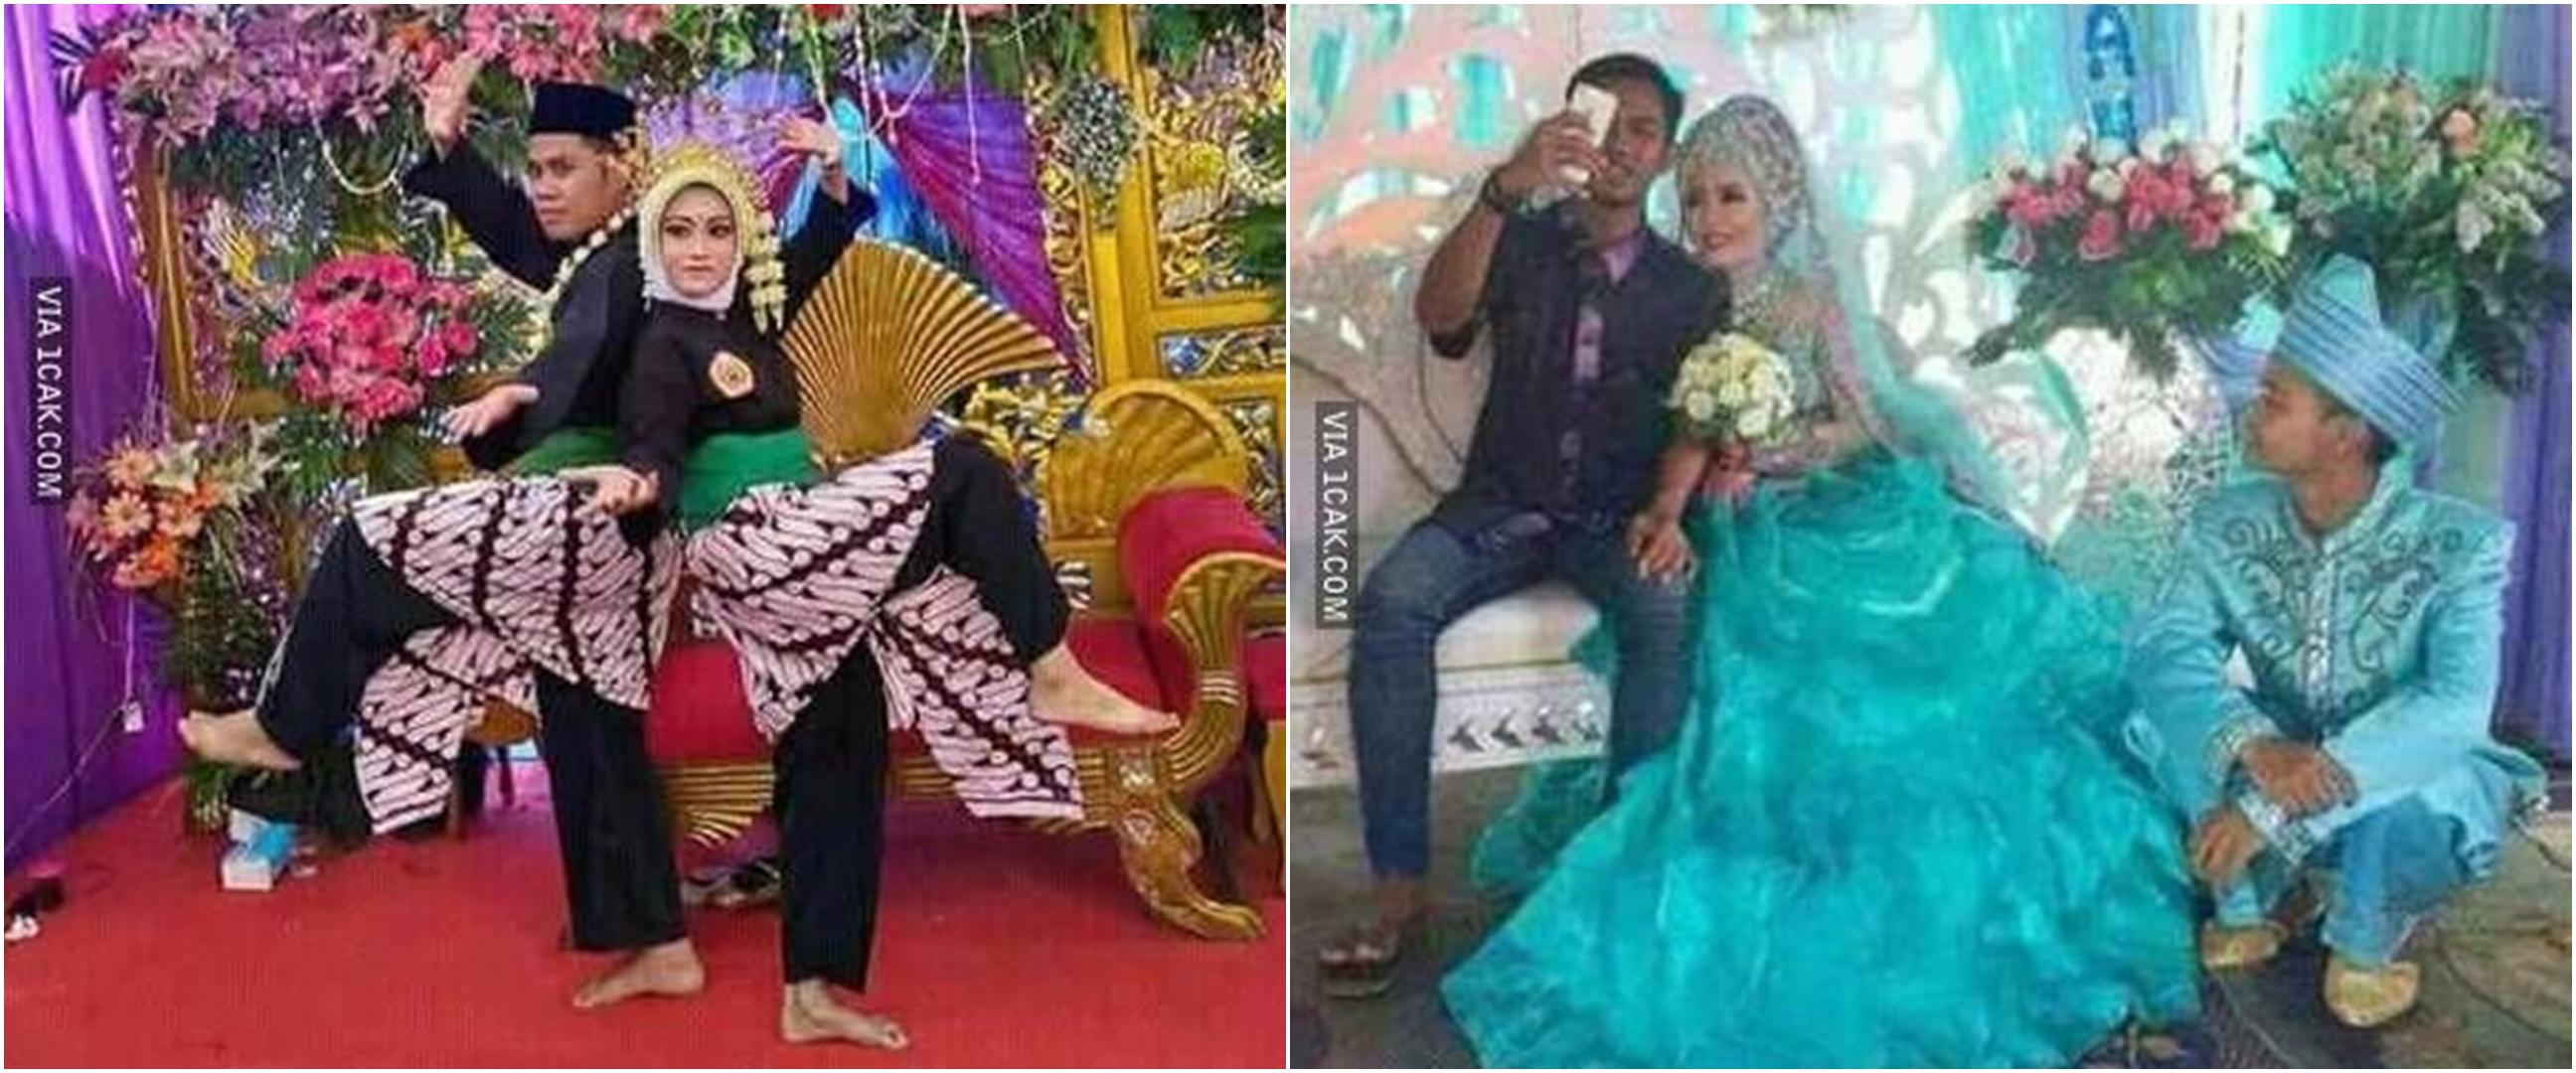 11 Kelakuan nyeleneh pengantin saat di pelaminan, bikin senyum kecut